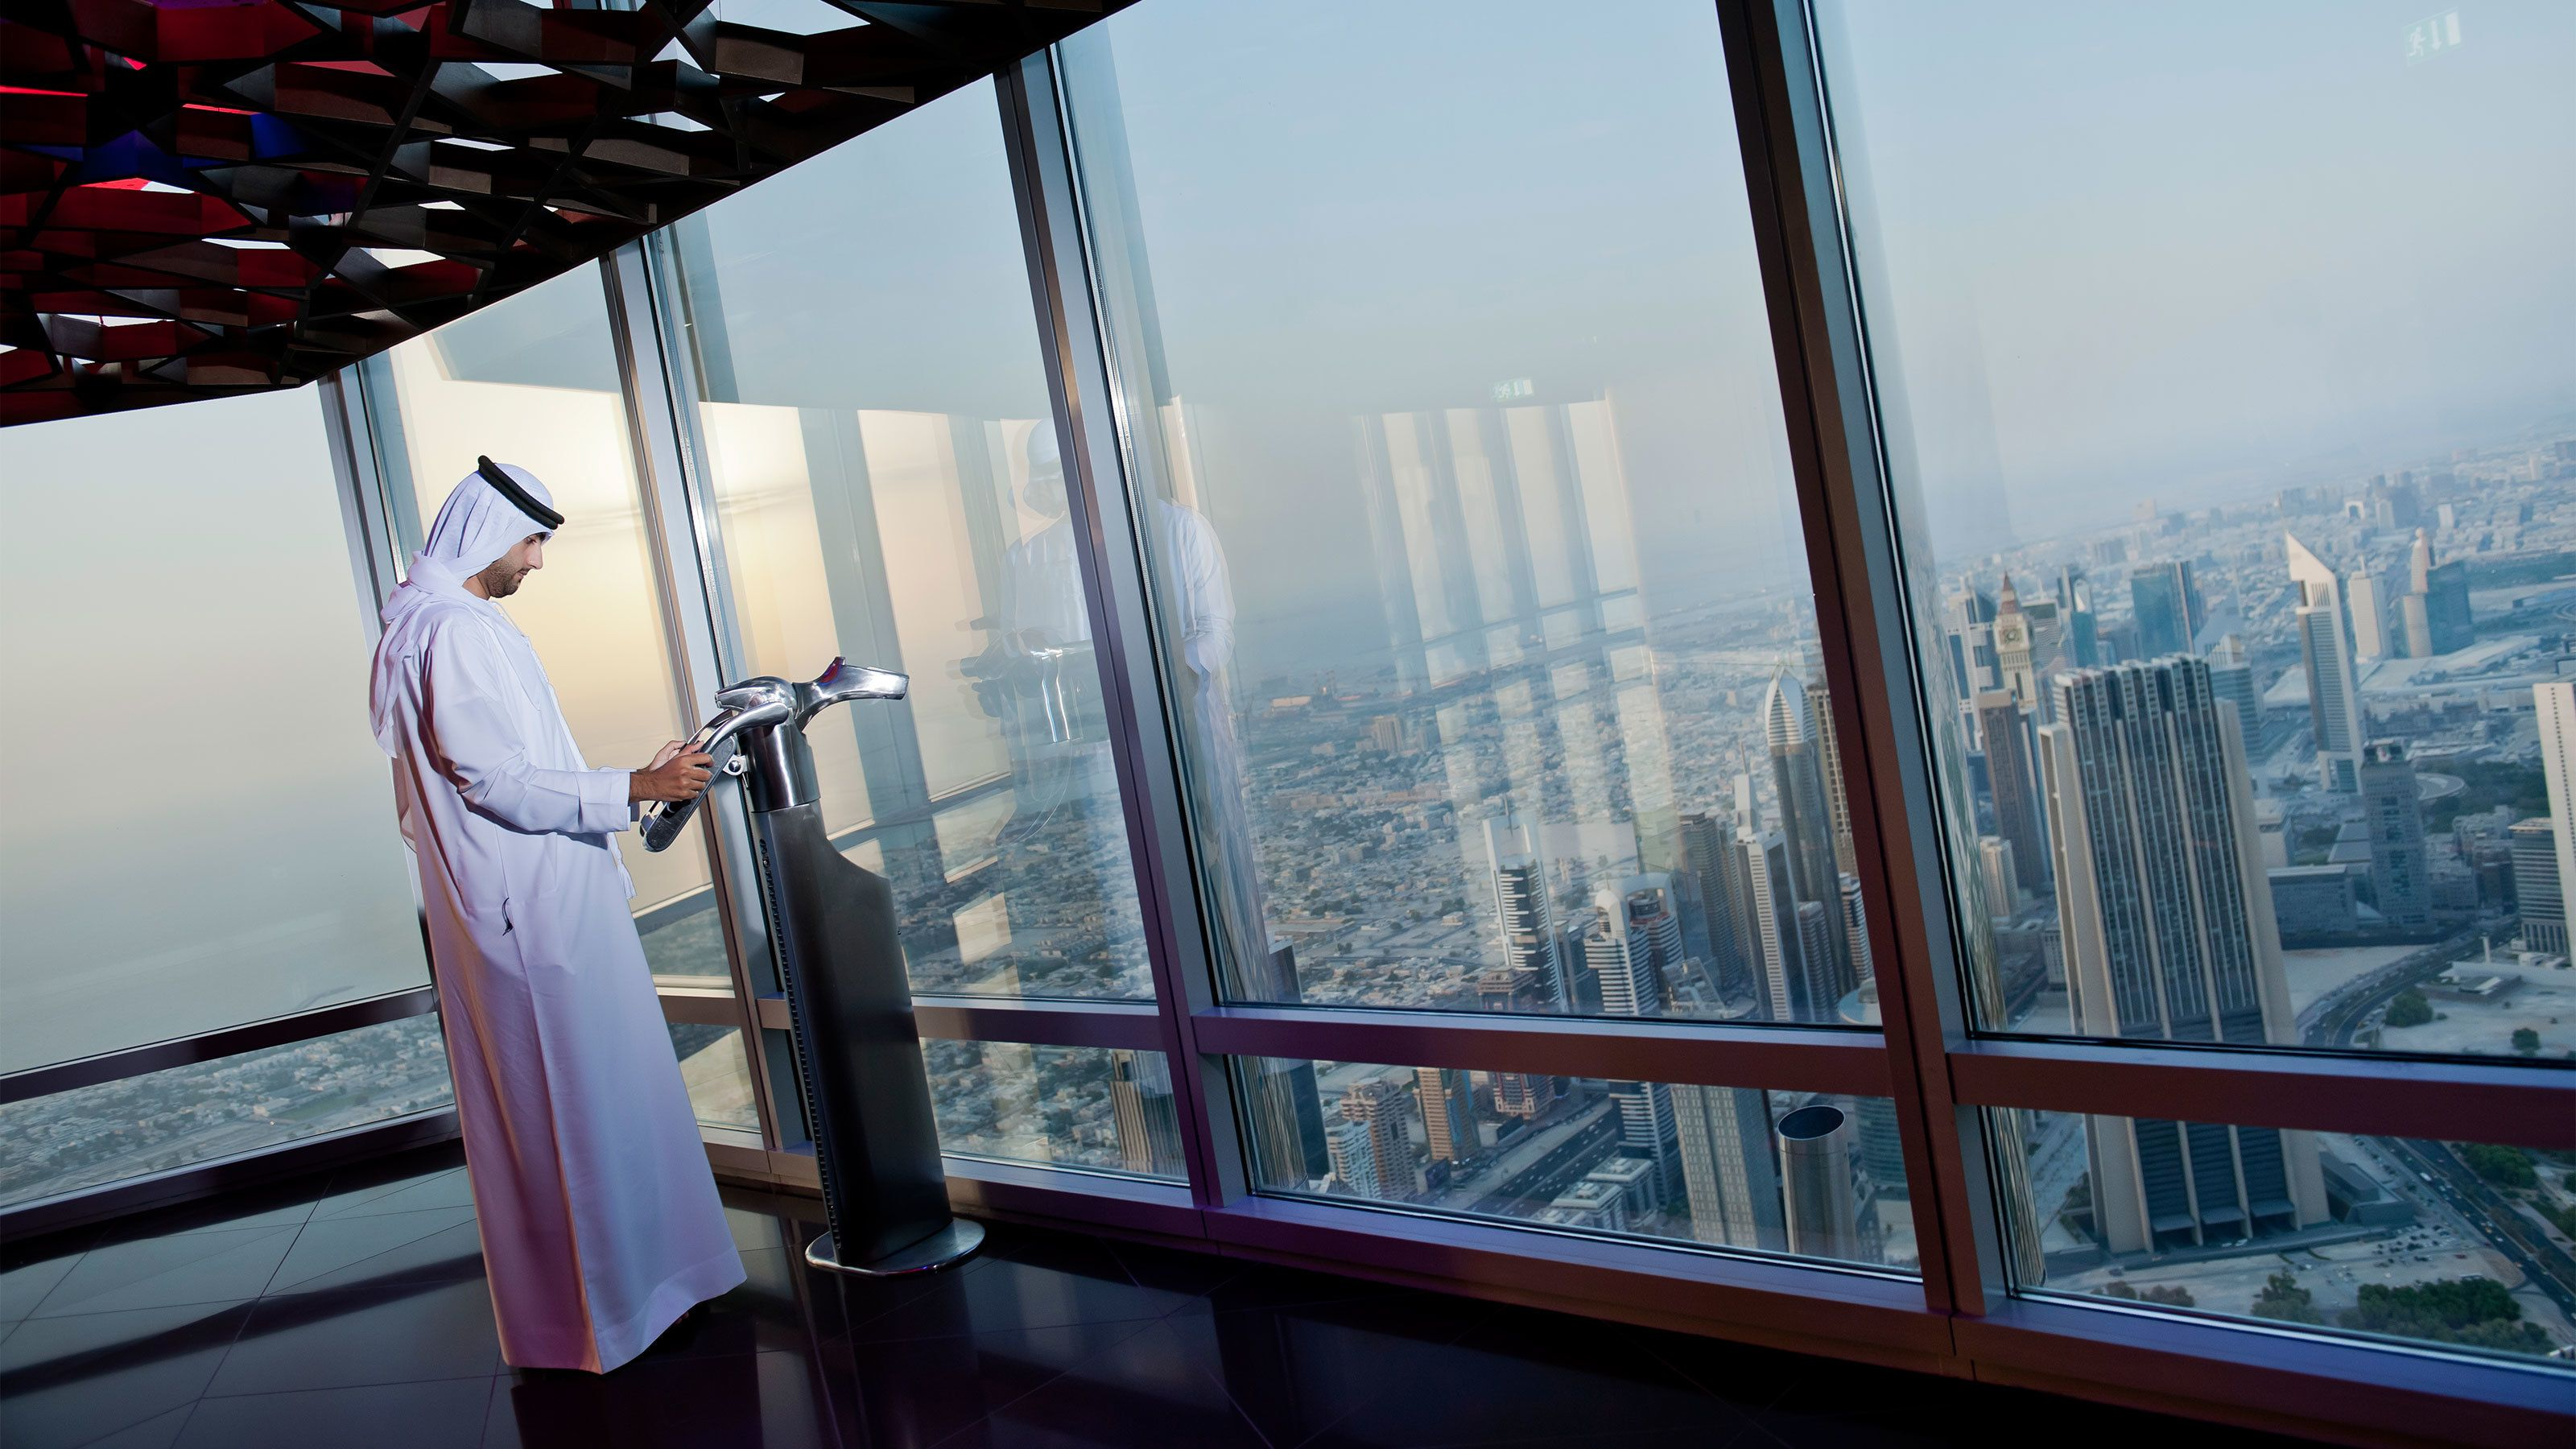 Biljett till Burj Khalifa SKY Lounge, 148:e våningen